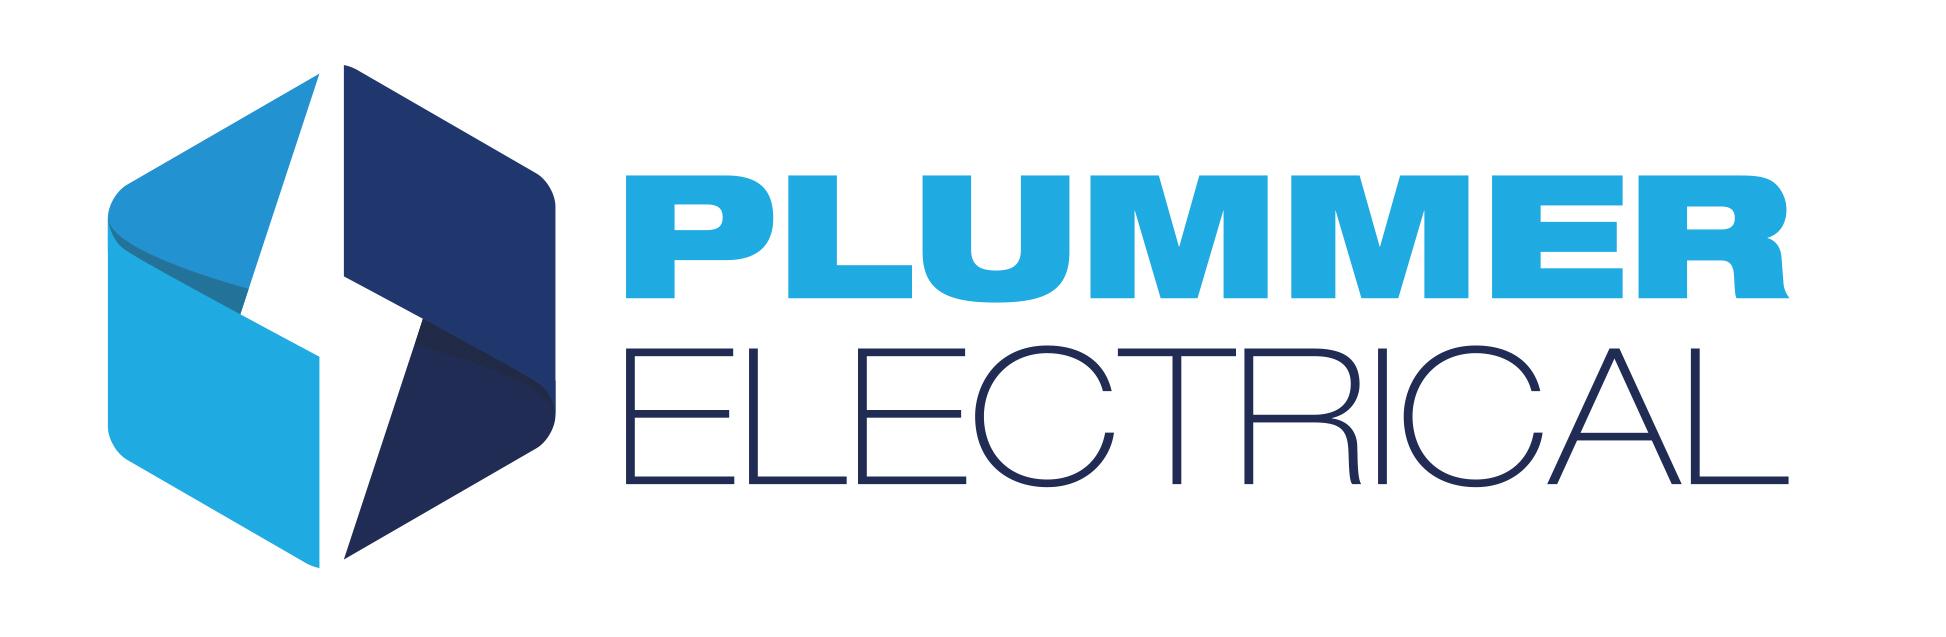 Plummer Electrical